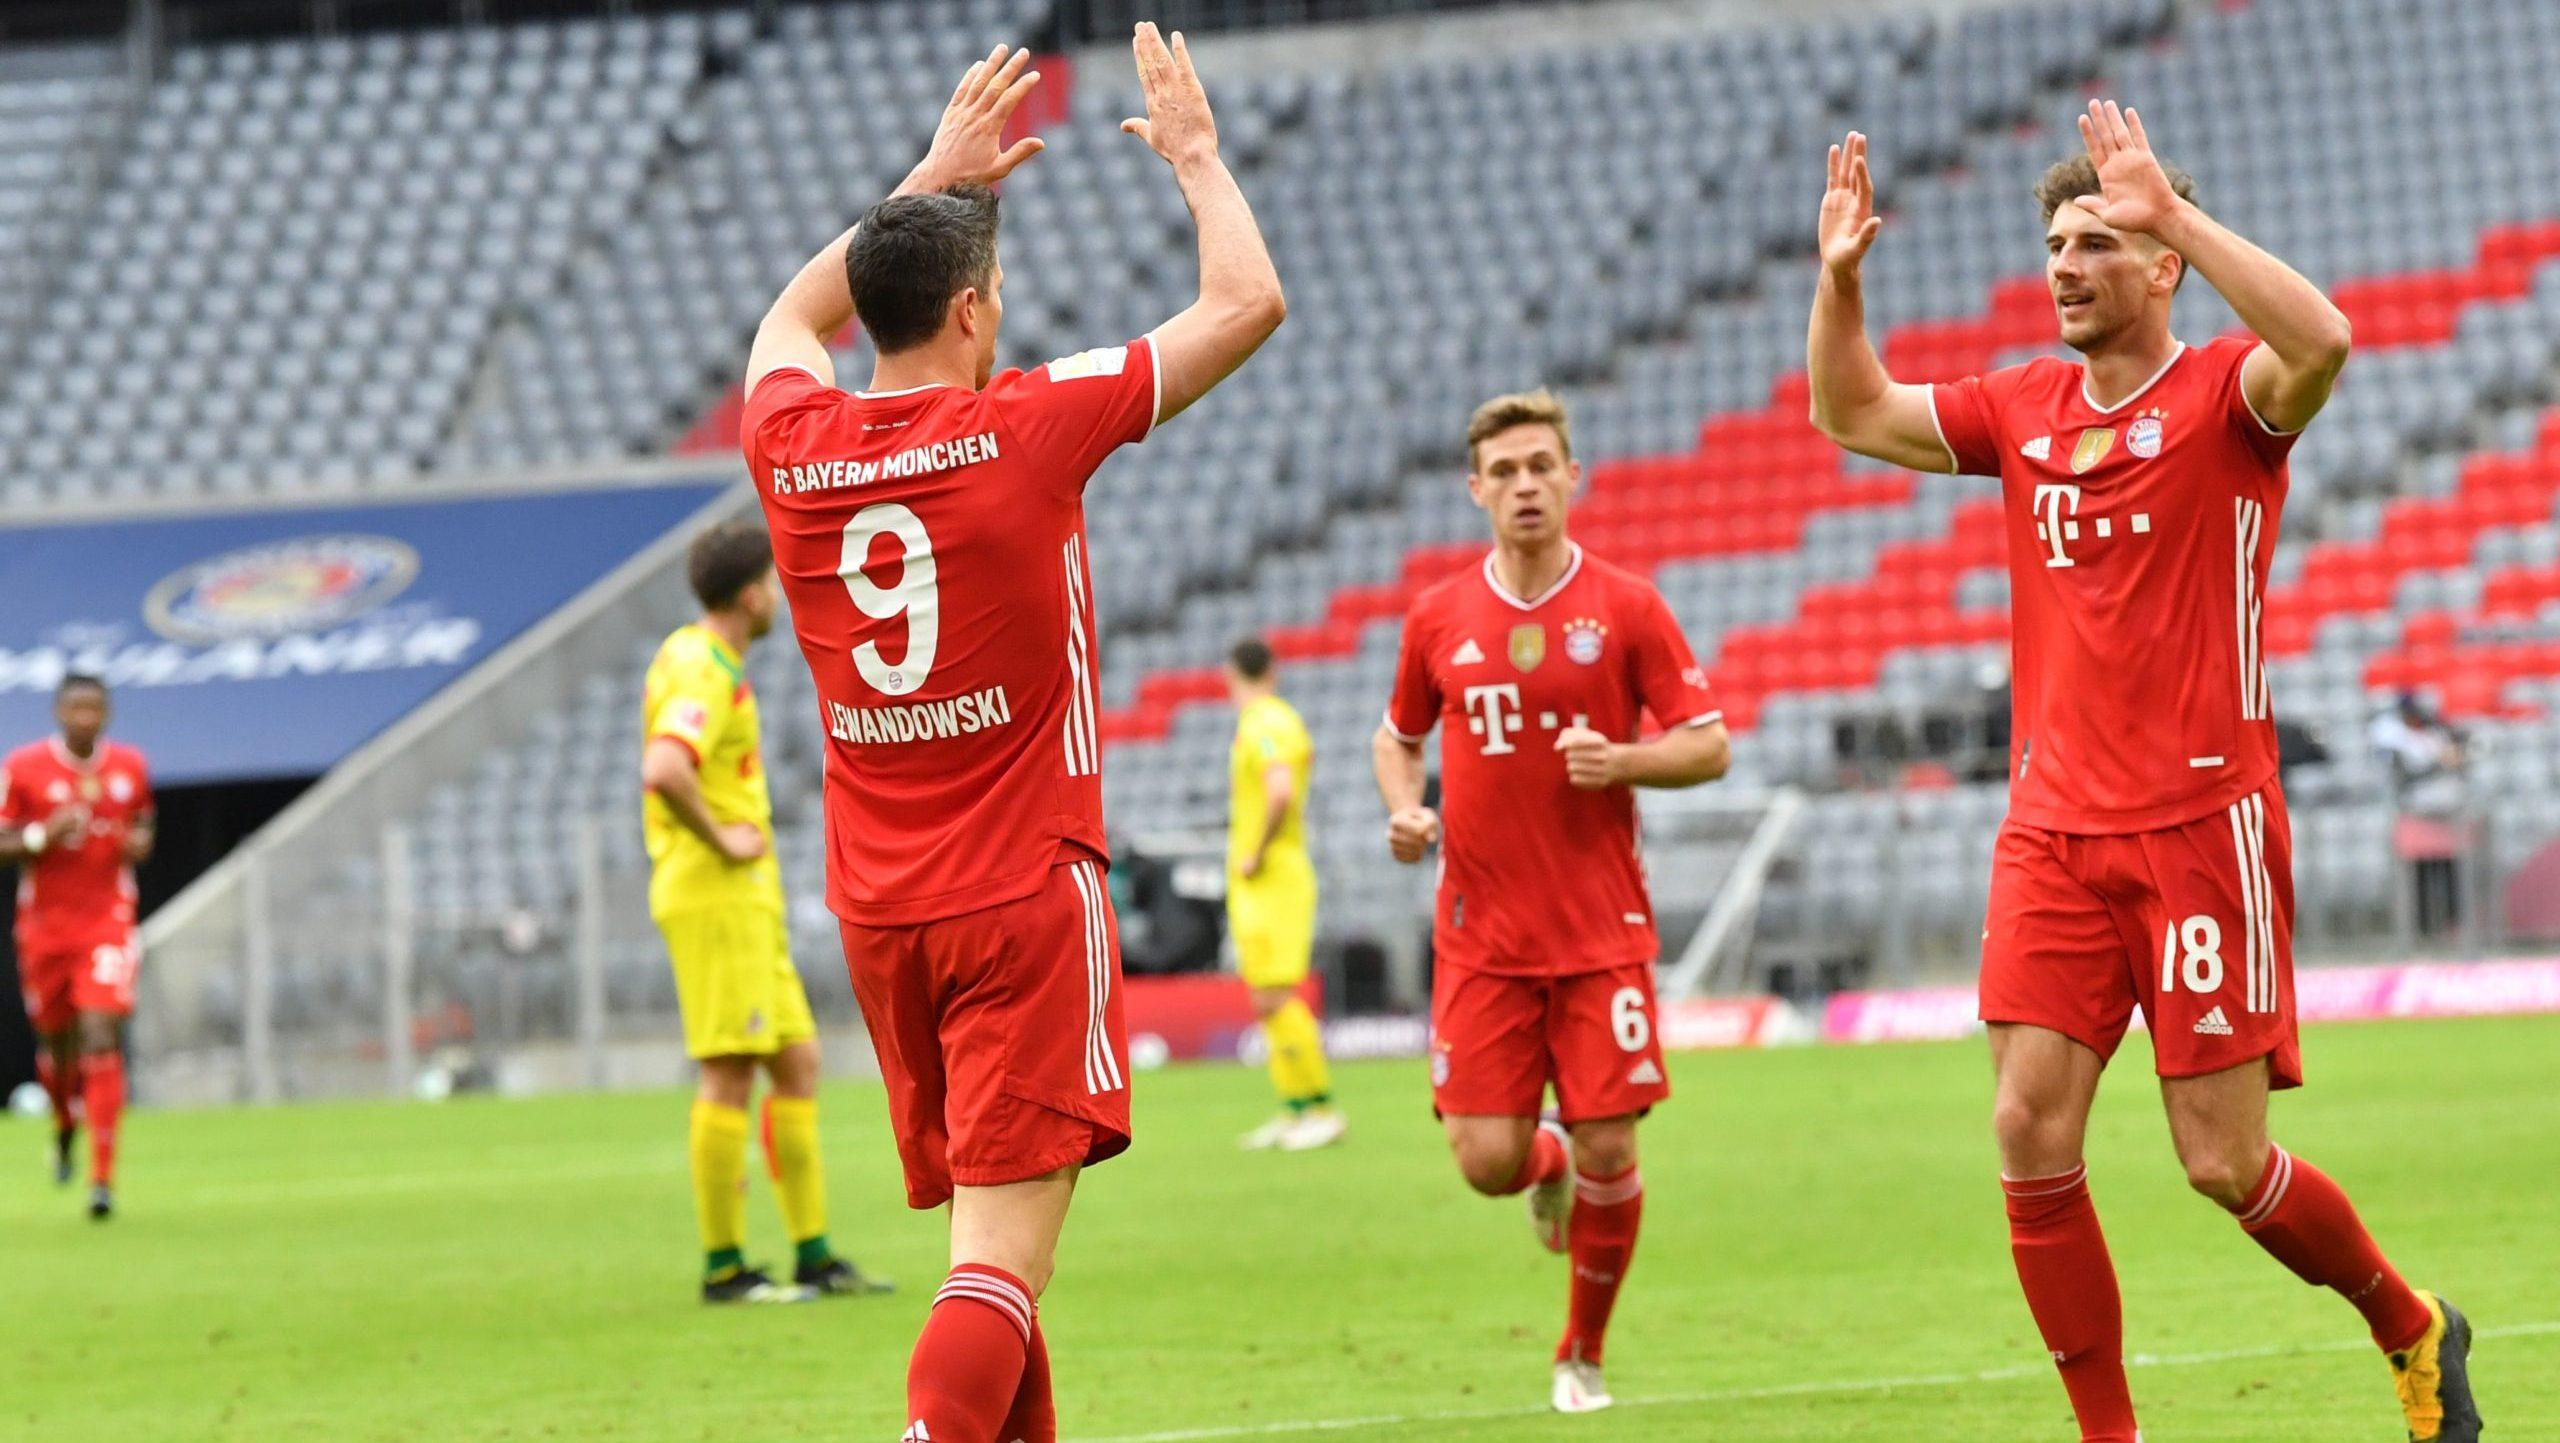 Der FC Bayern gewinnt 5:1 gegen den 1. FC Köln